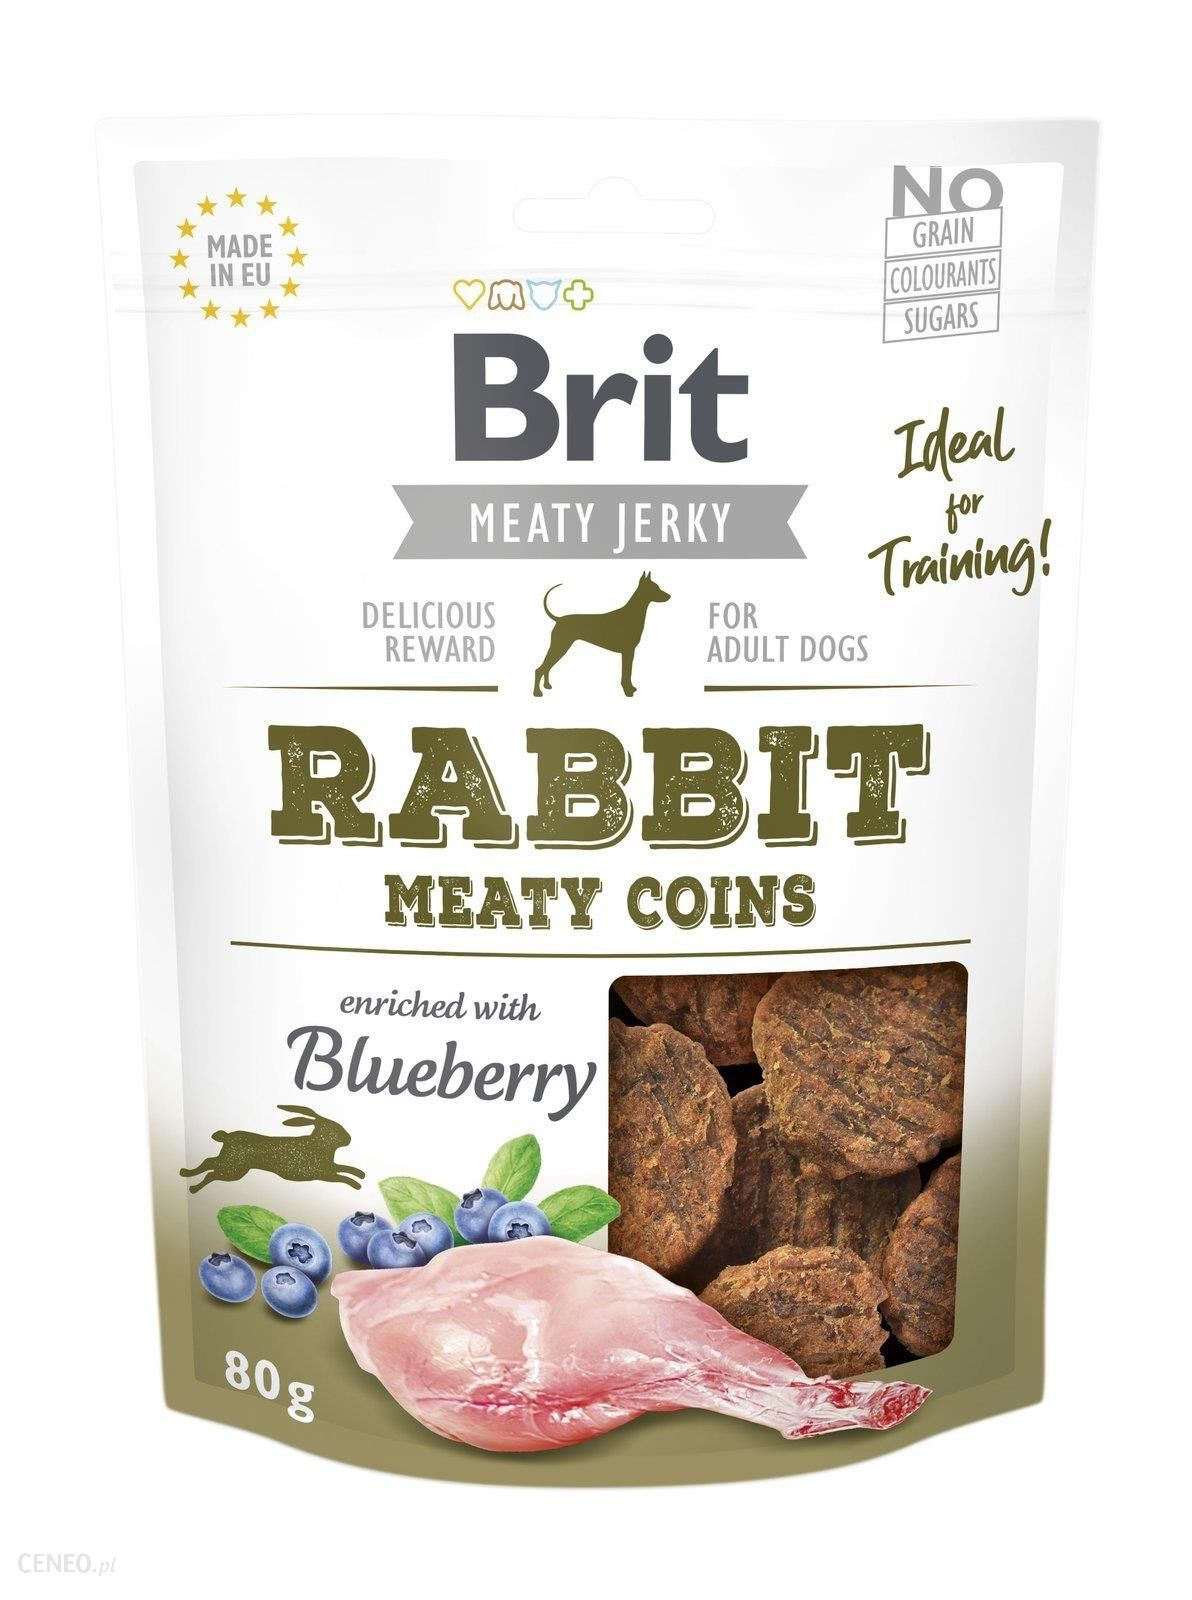 Brit Jerky Snack Rabbit Meaty Coins Królik 80G